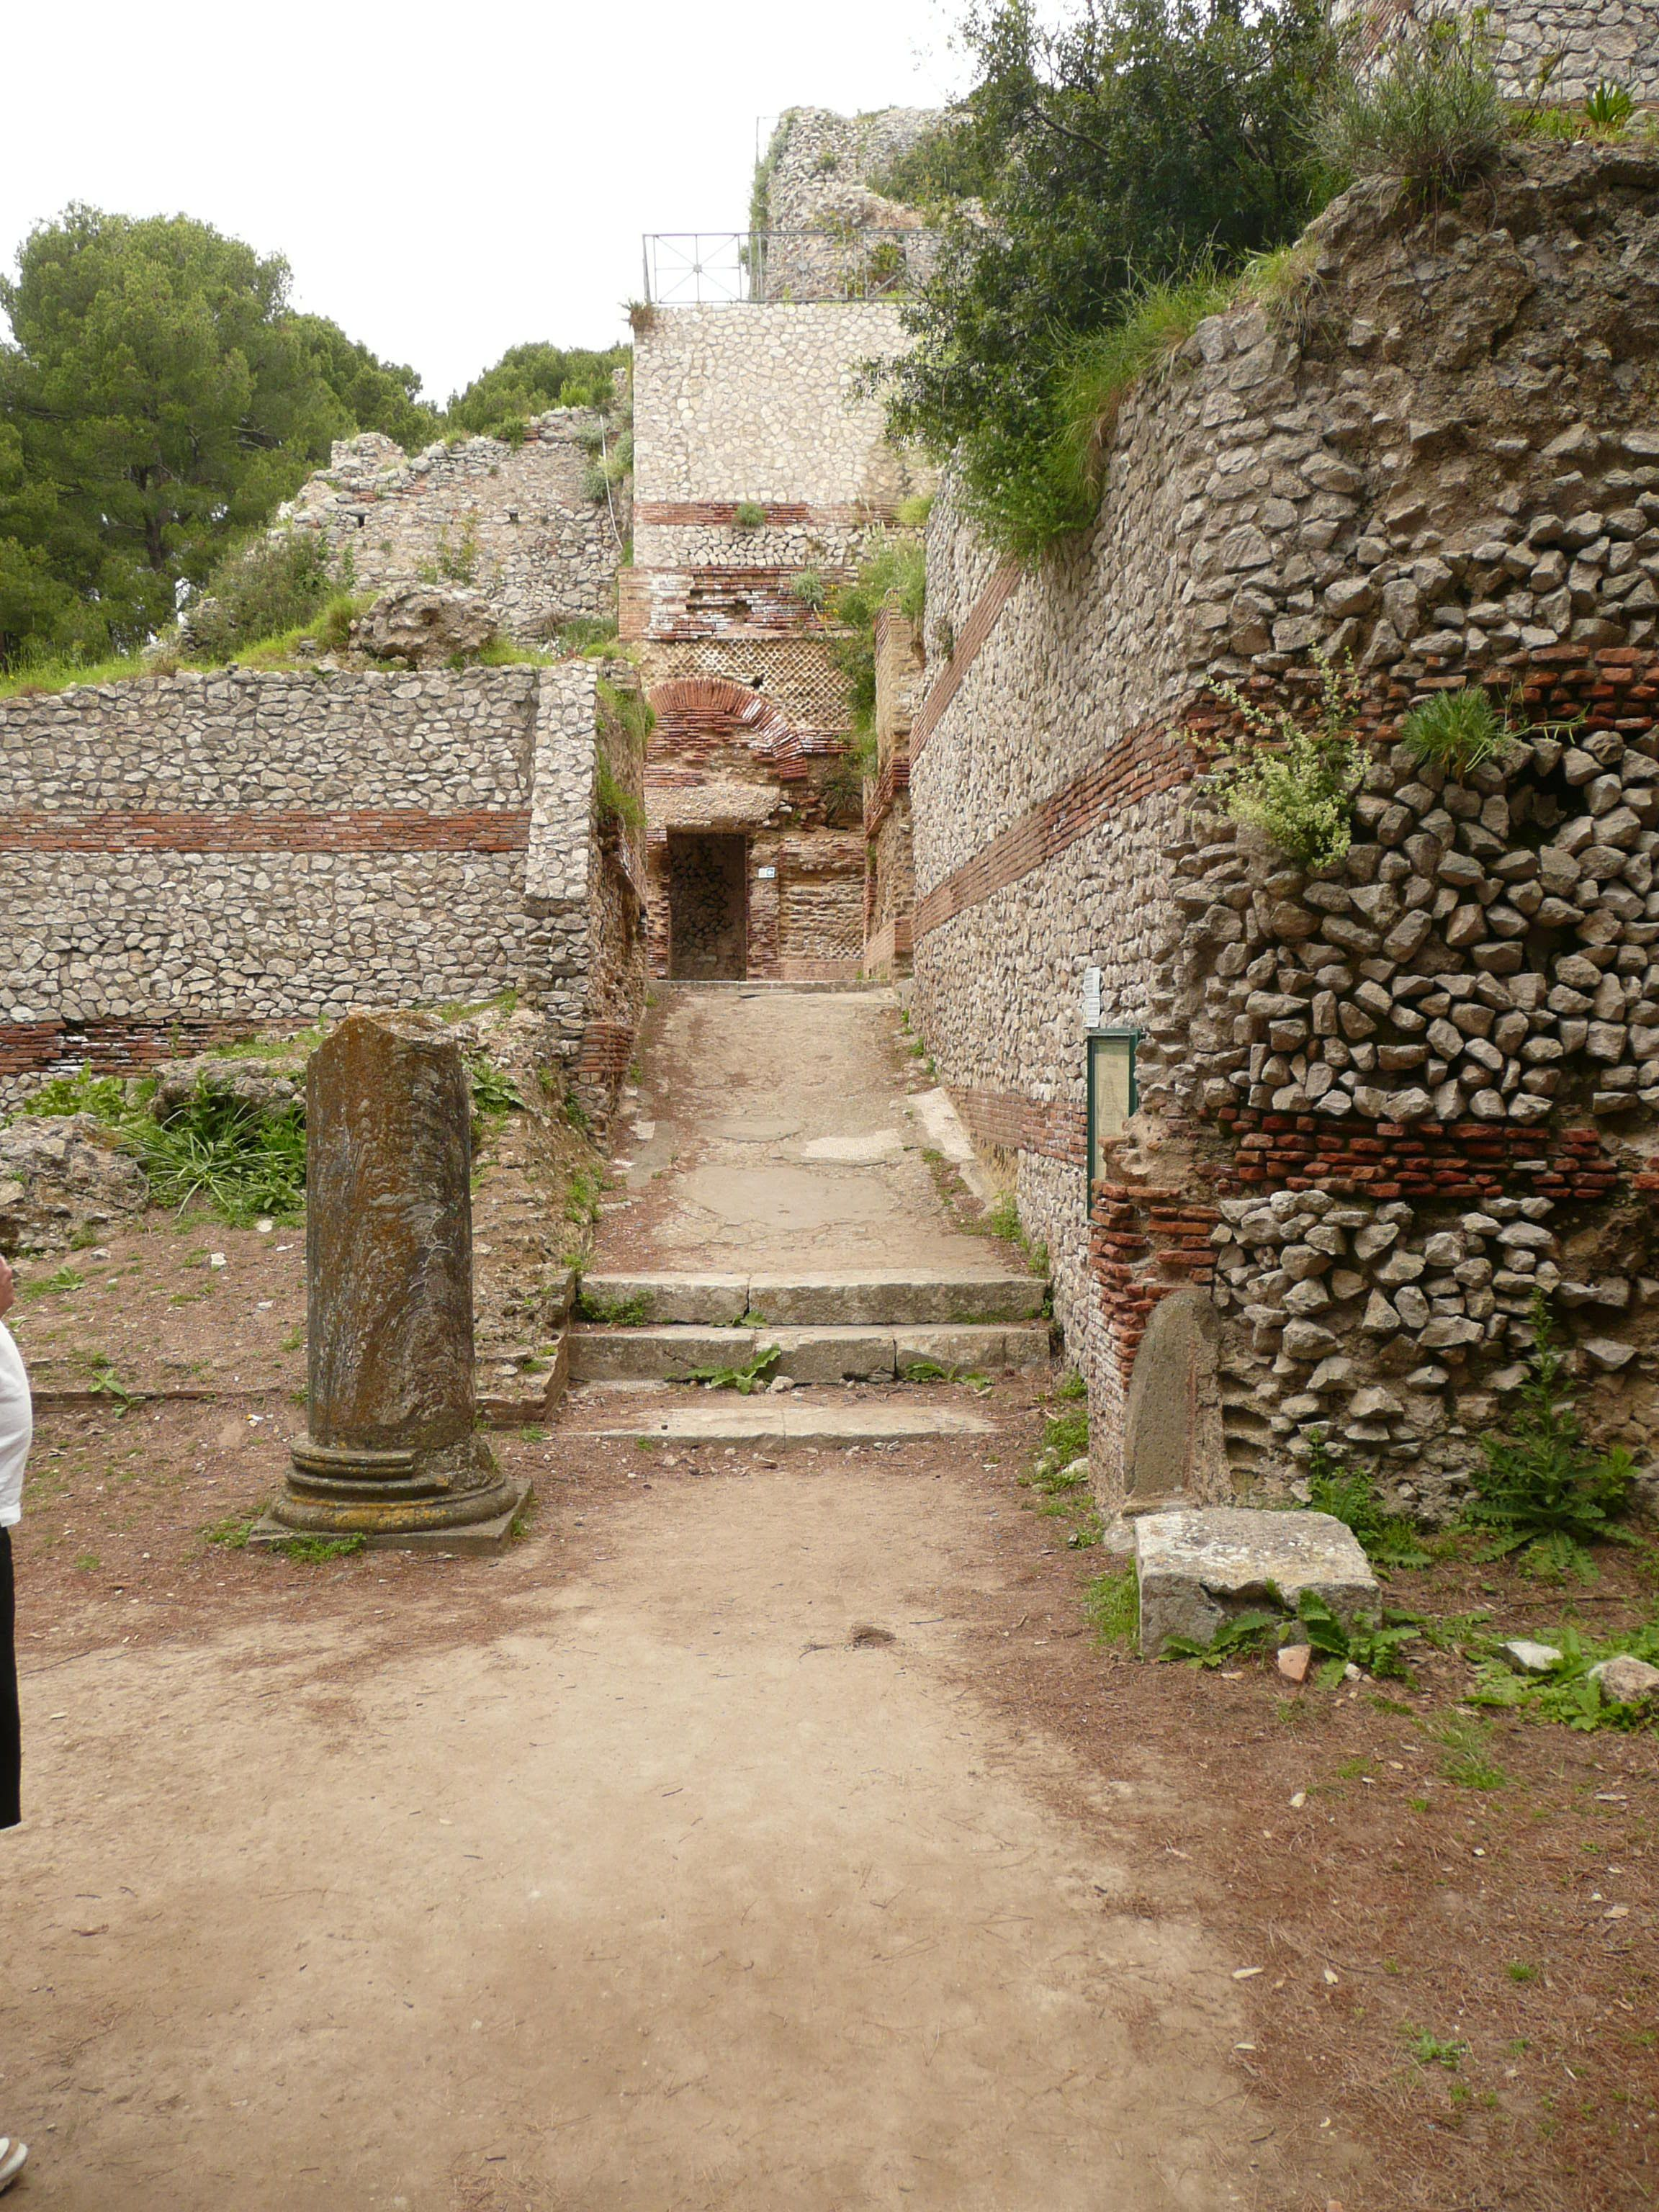 Entrance hall to Villa Jovis, Capri